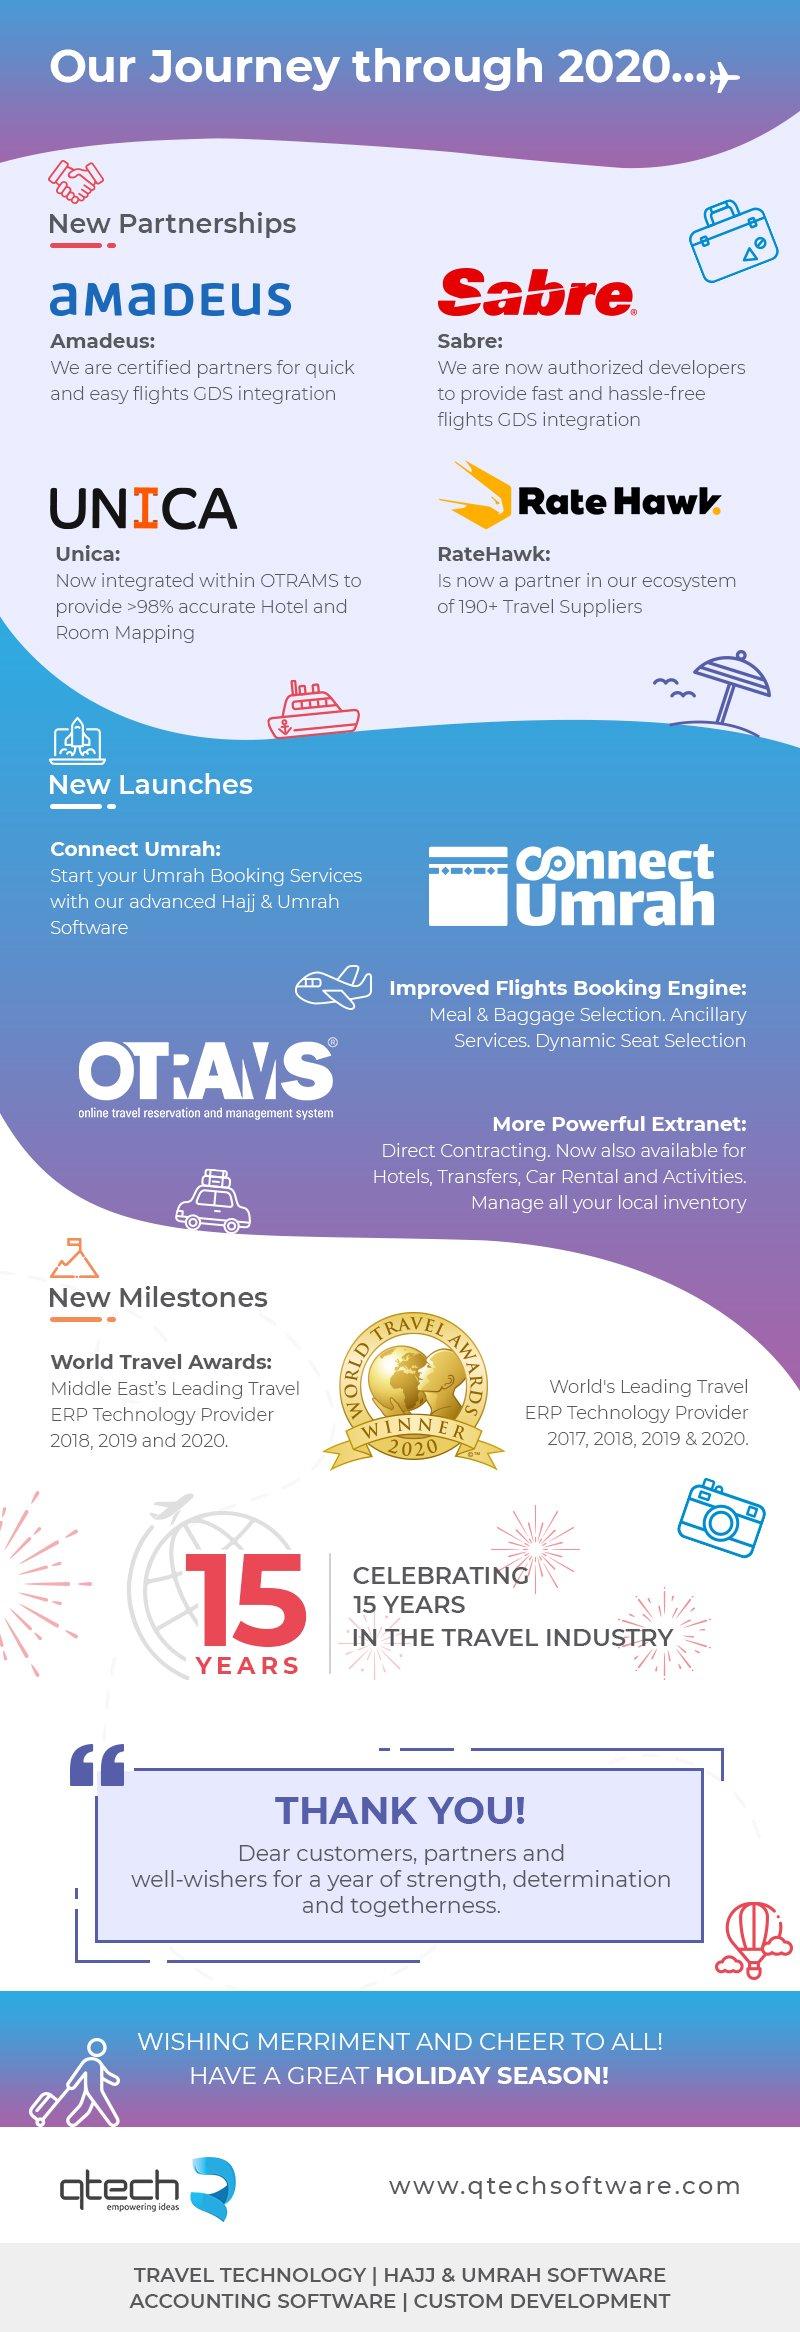 QtechSoftware_journey2020_TravelTechnologyCompany